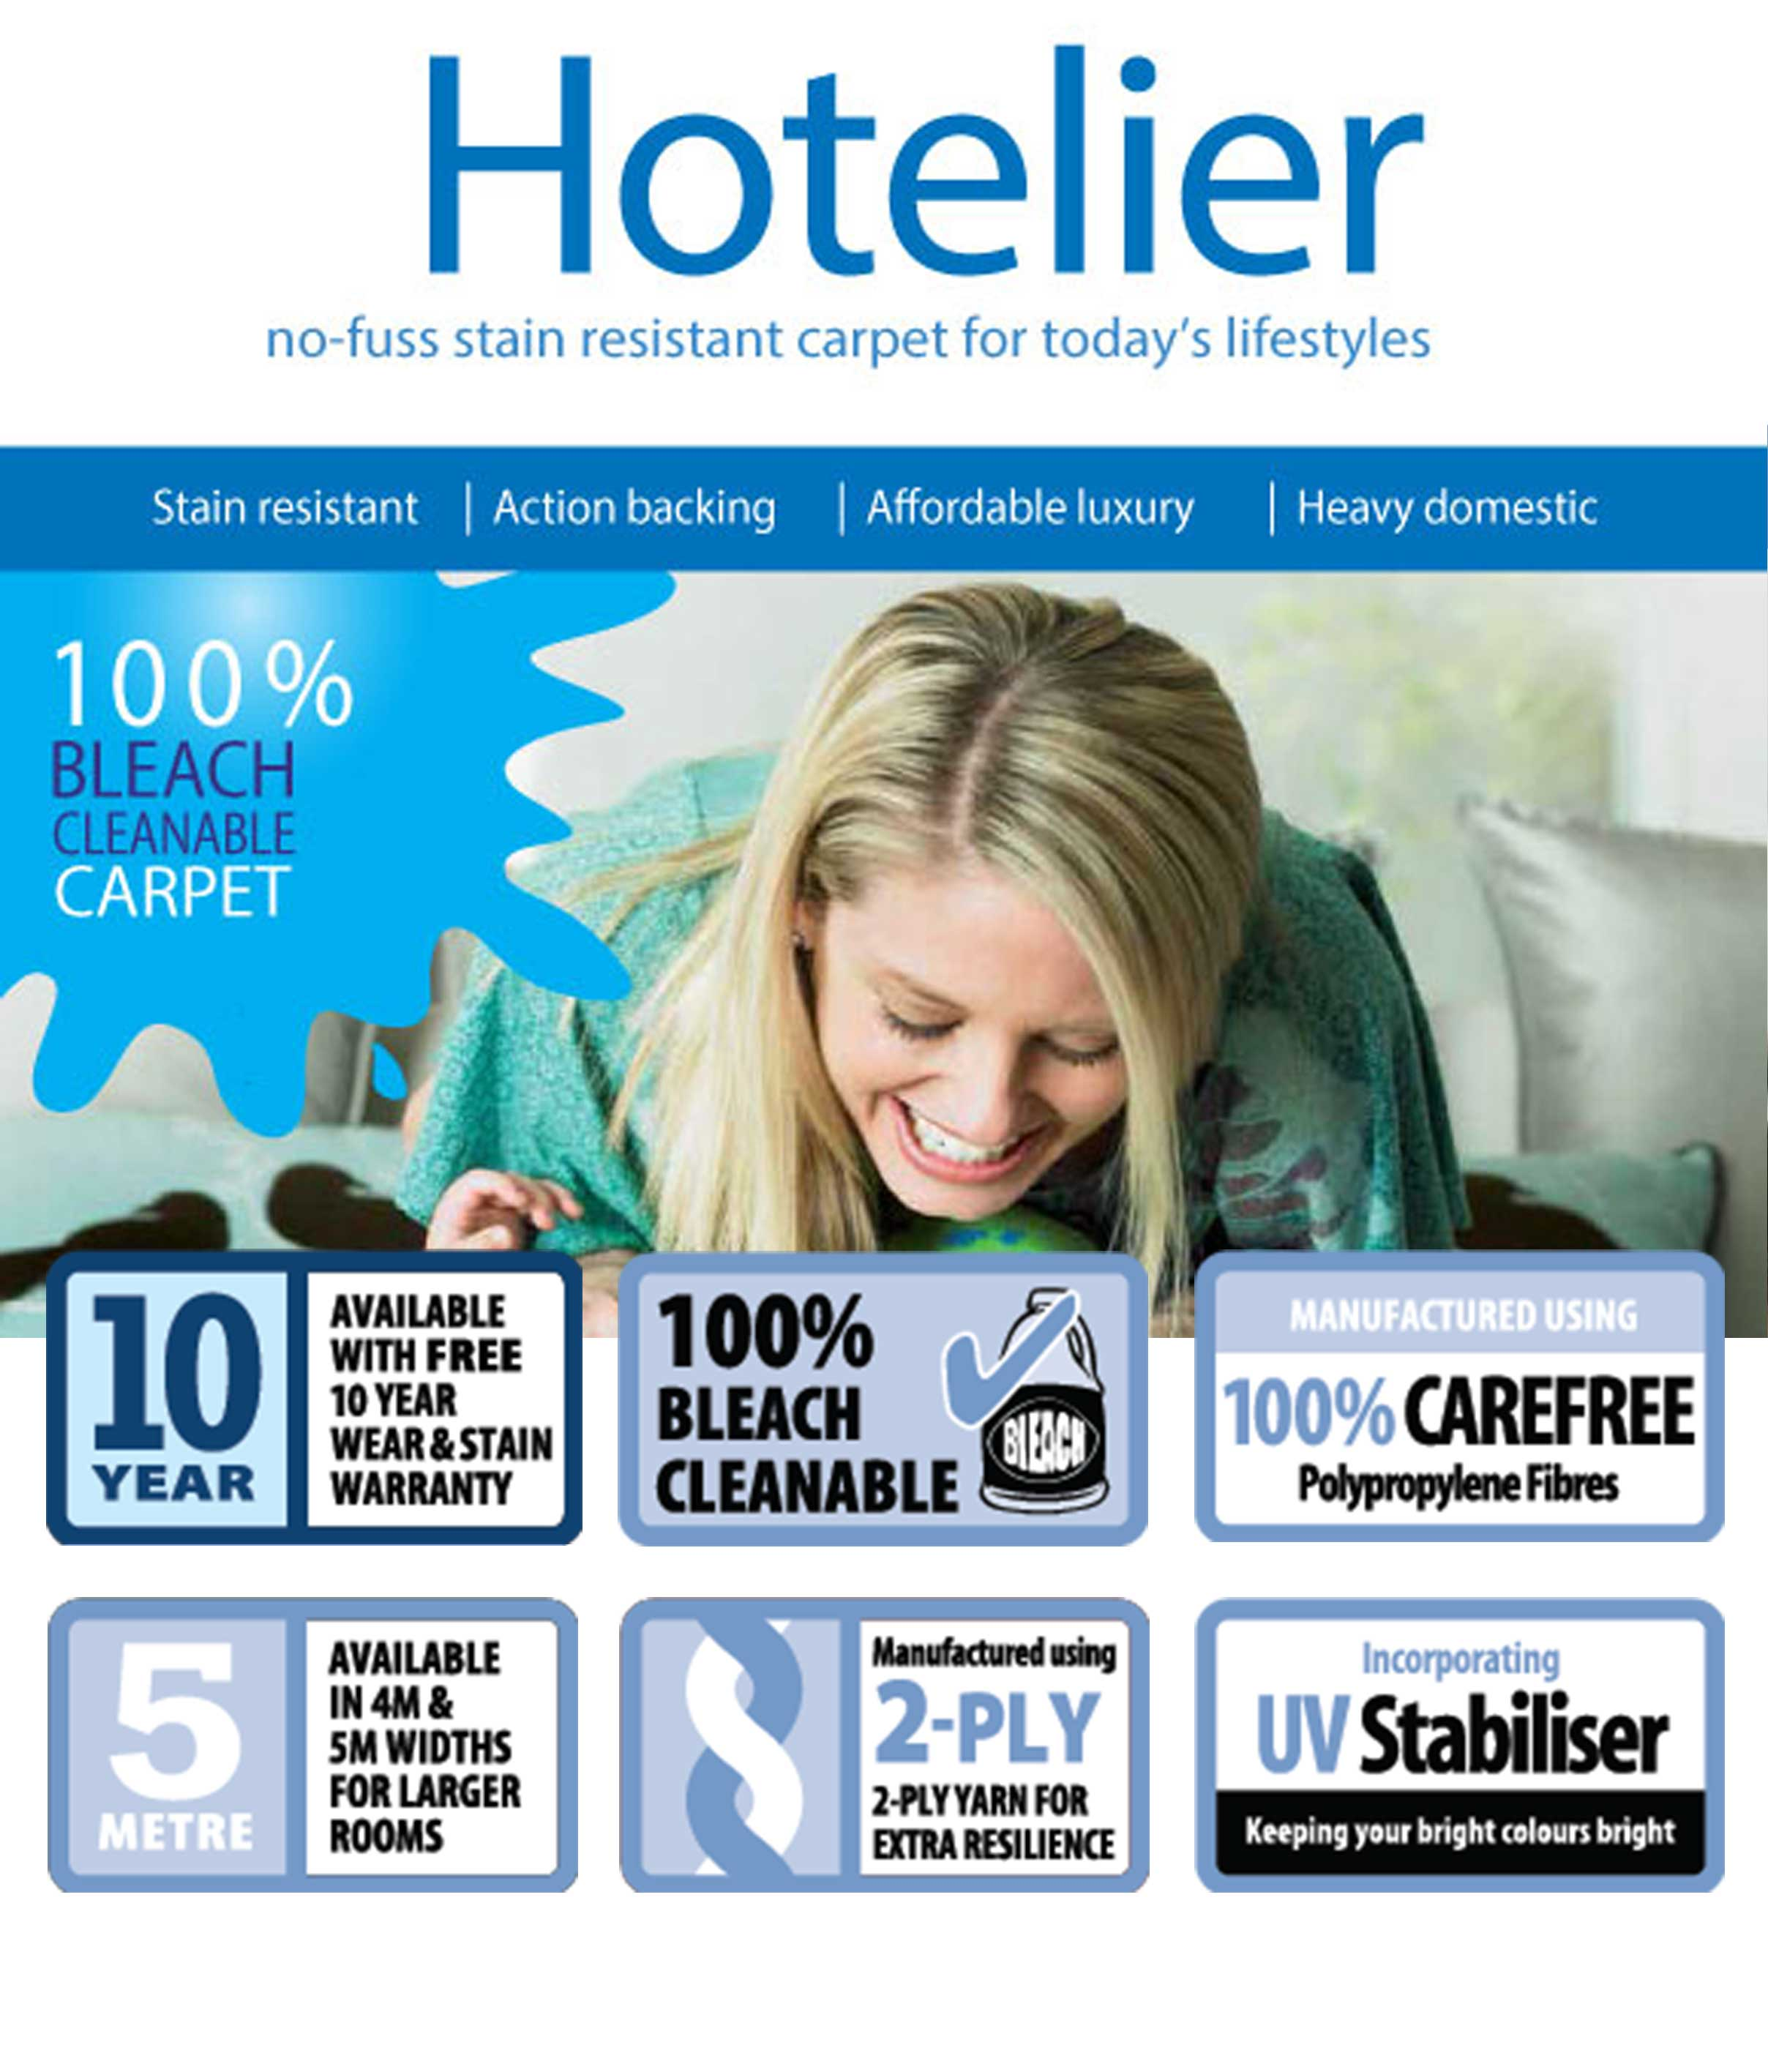 Hotelier-Carpet